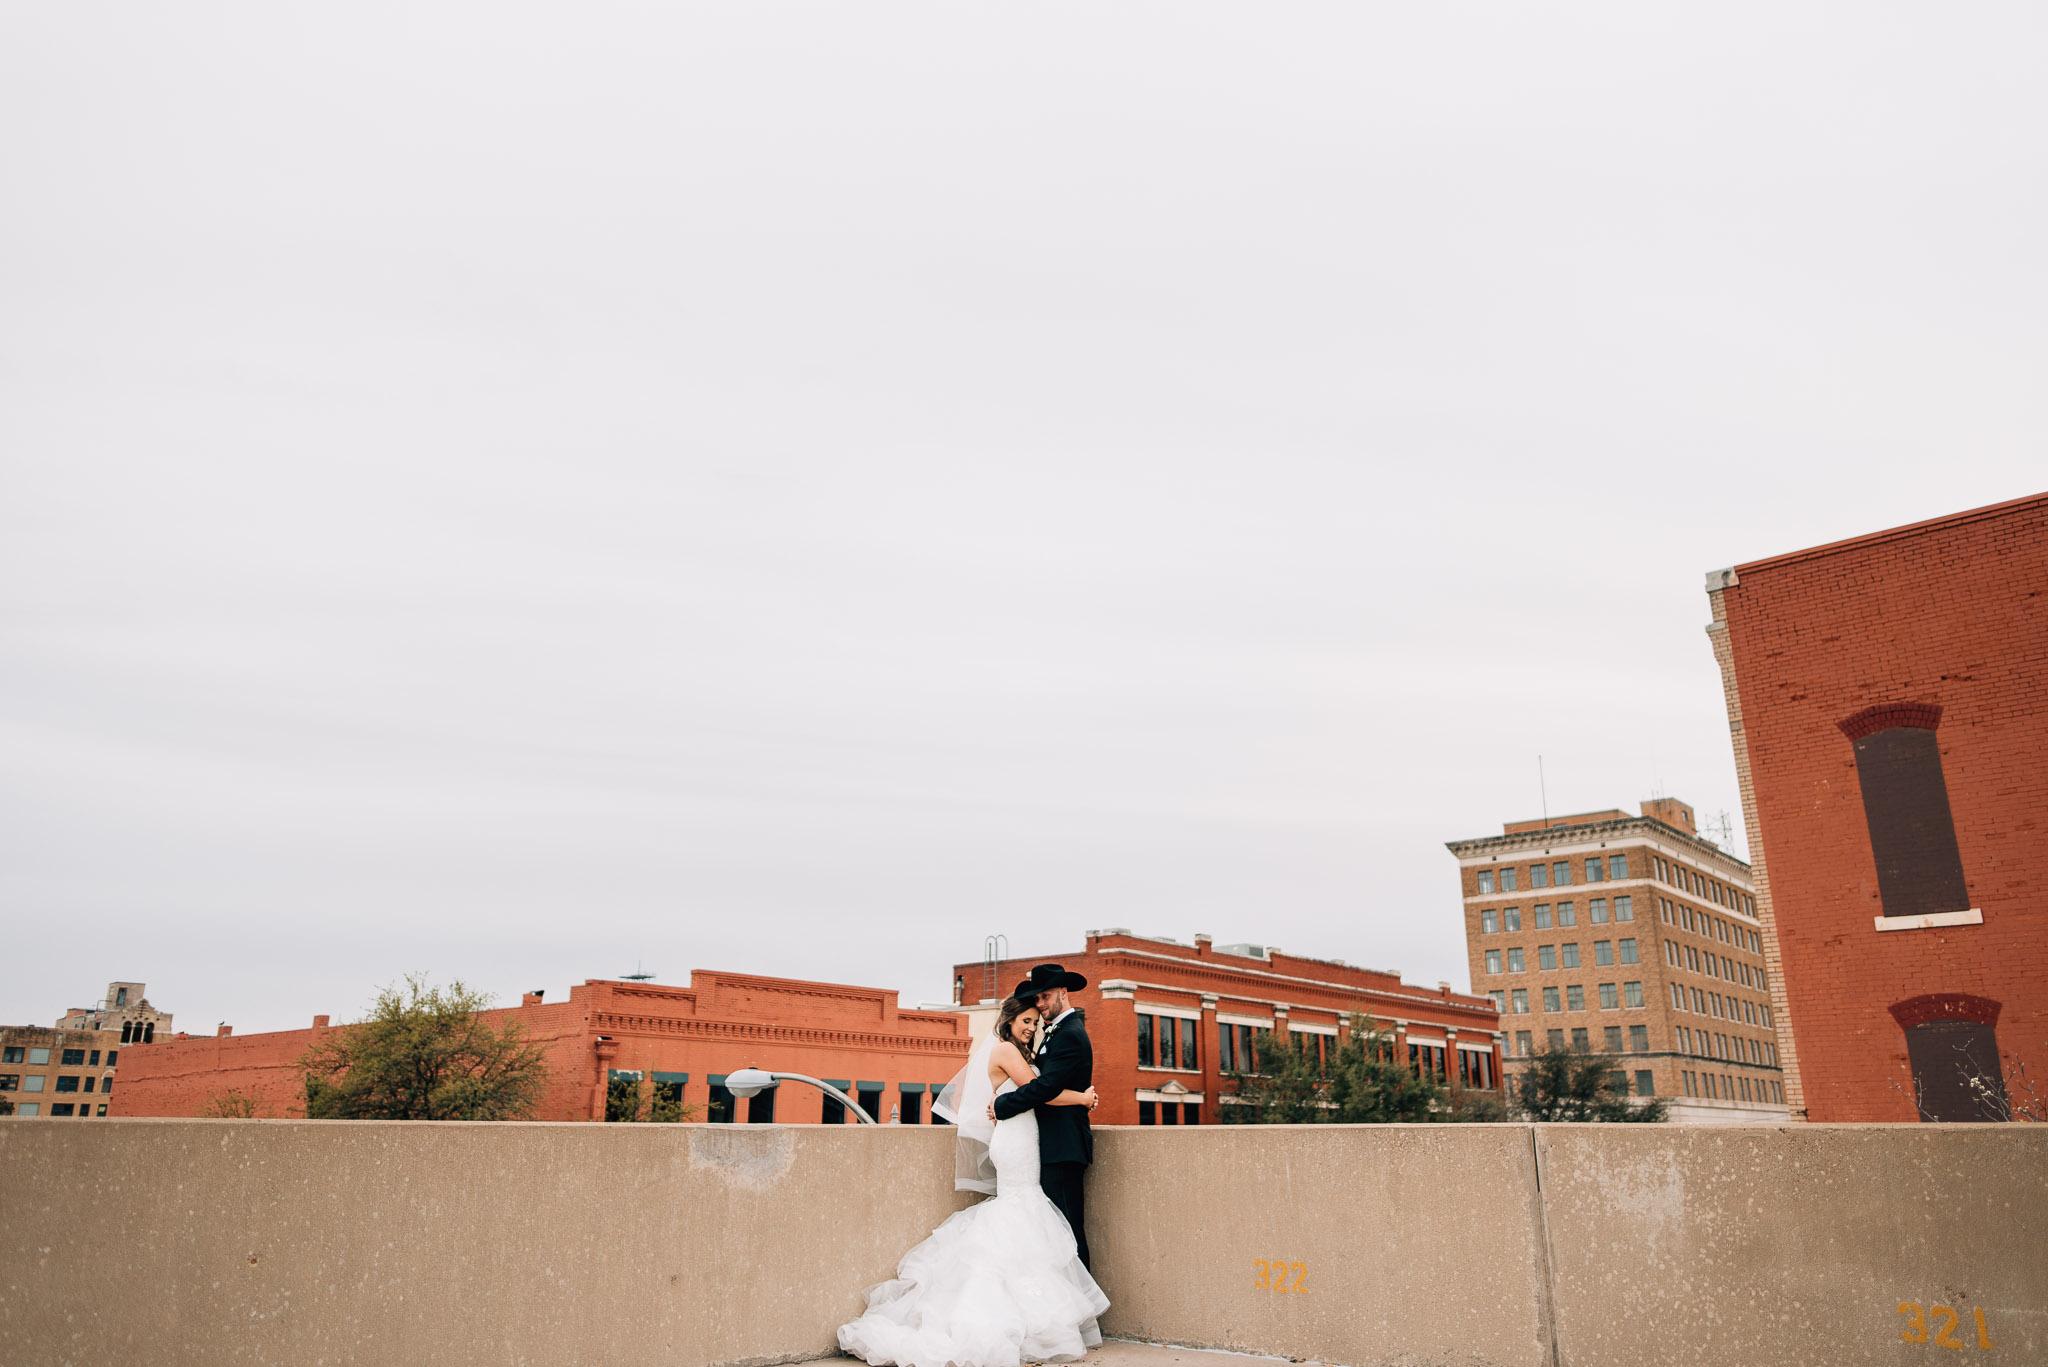 Cactus-Hotel-Wedding-San-Angelo-0018.jpg